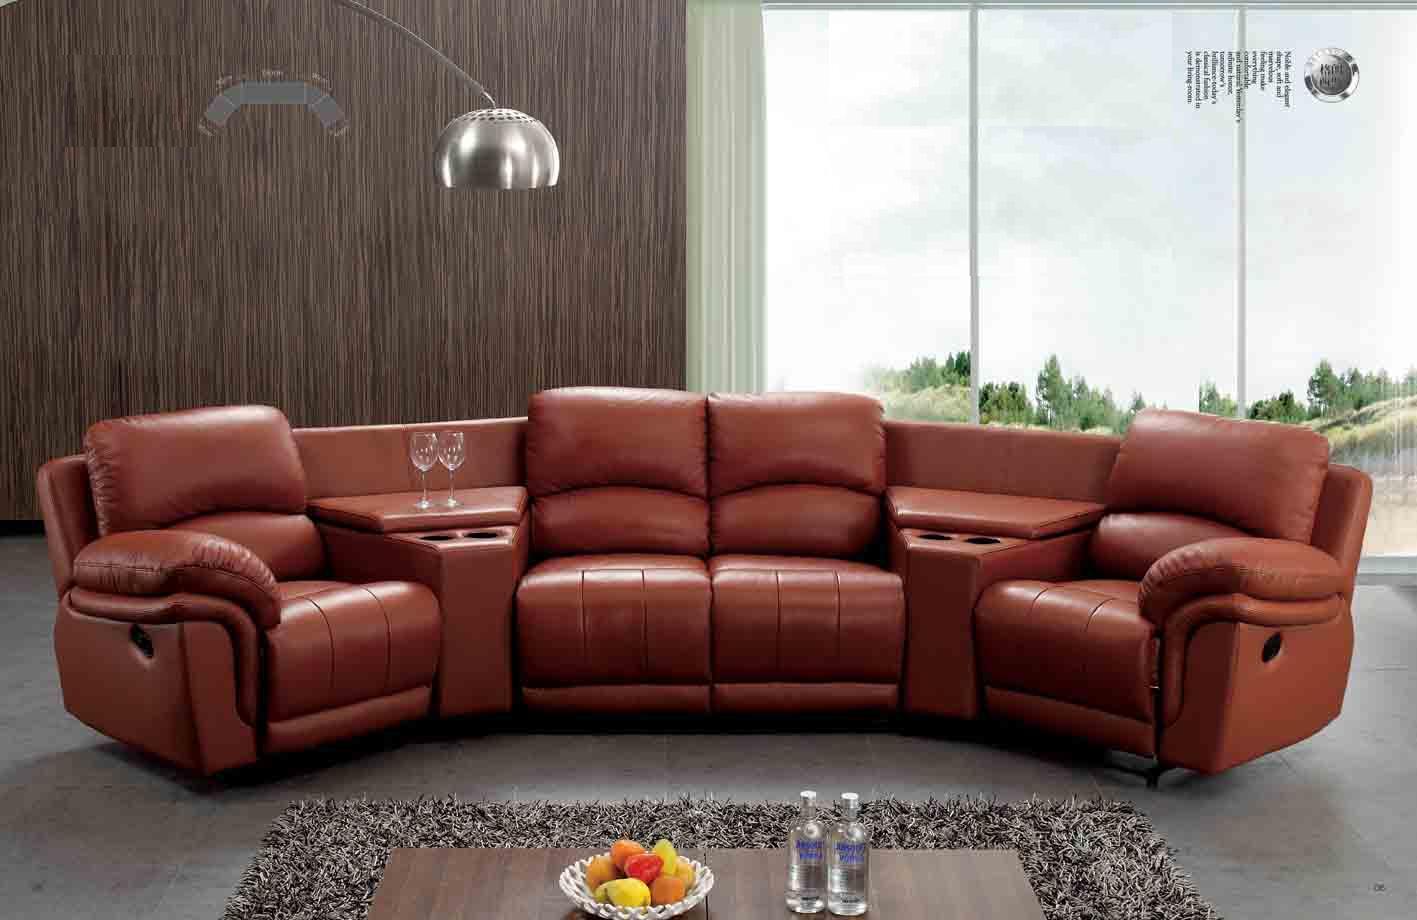 recliner sofas 4u   recliner sofas 4u XWCREKN